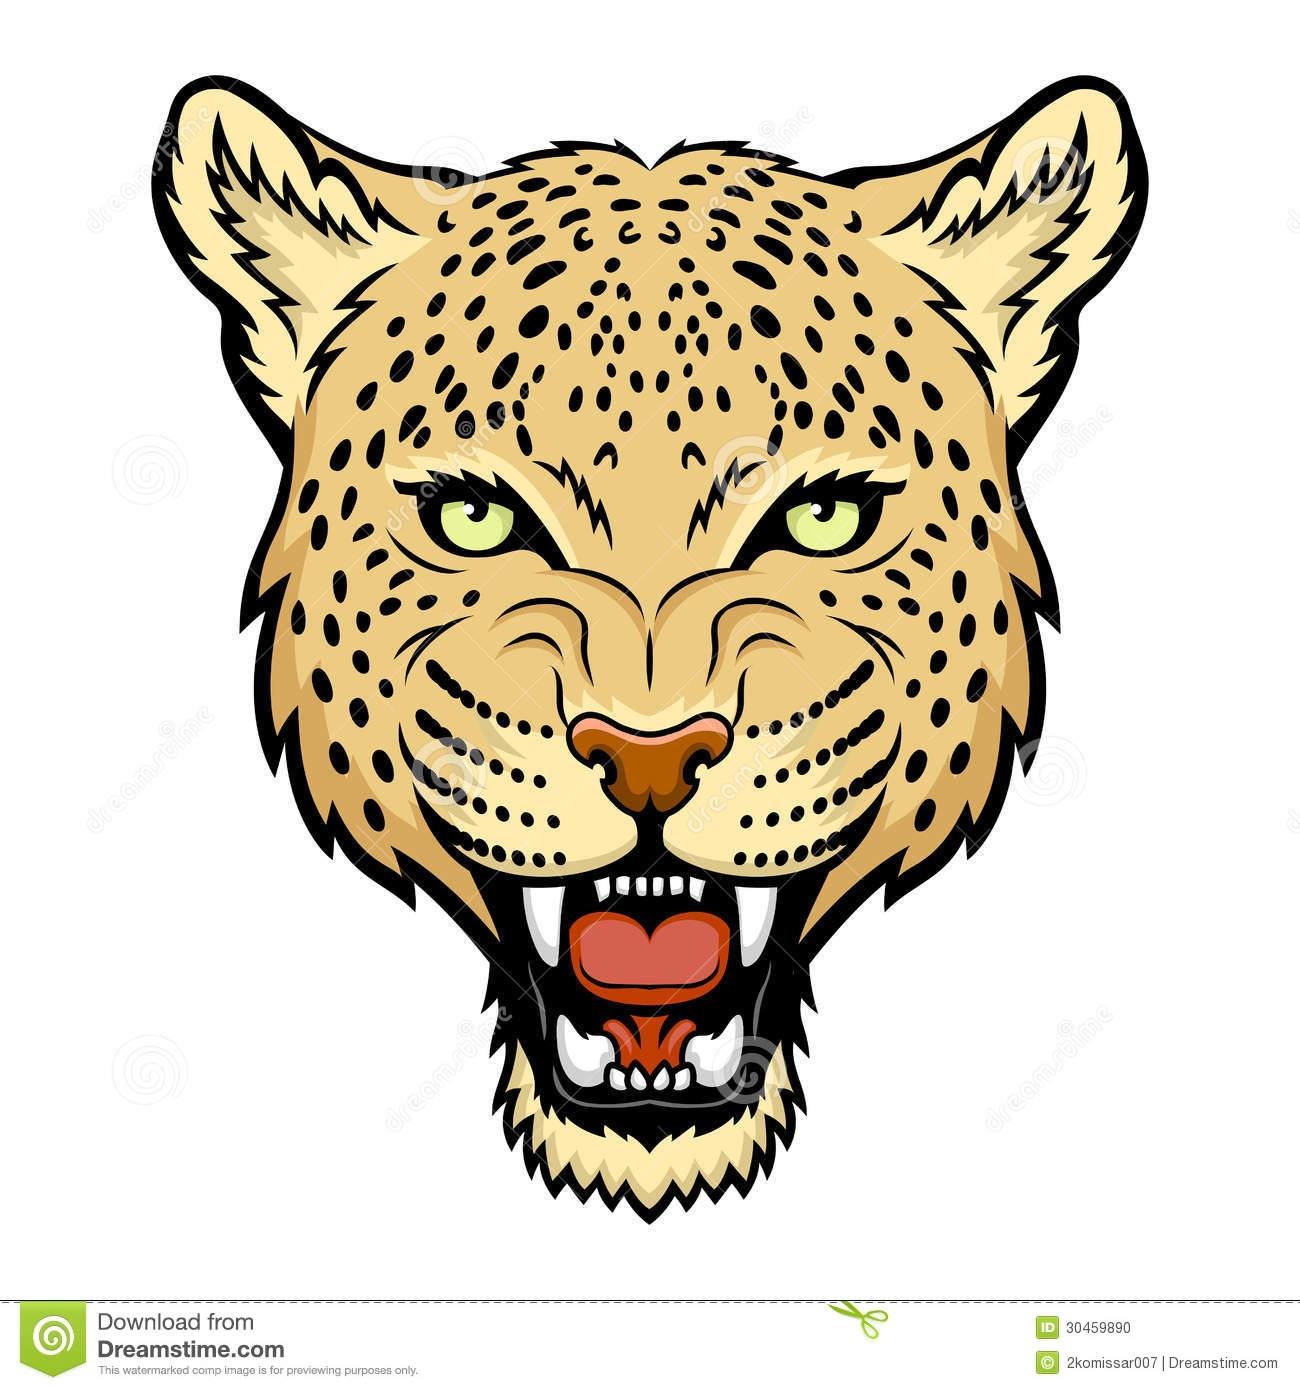 Amur Leopard clipart #19, Download drawings